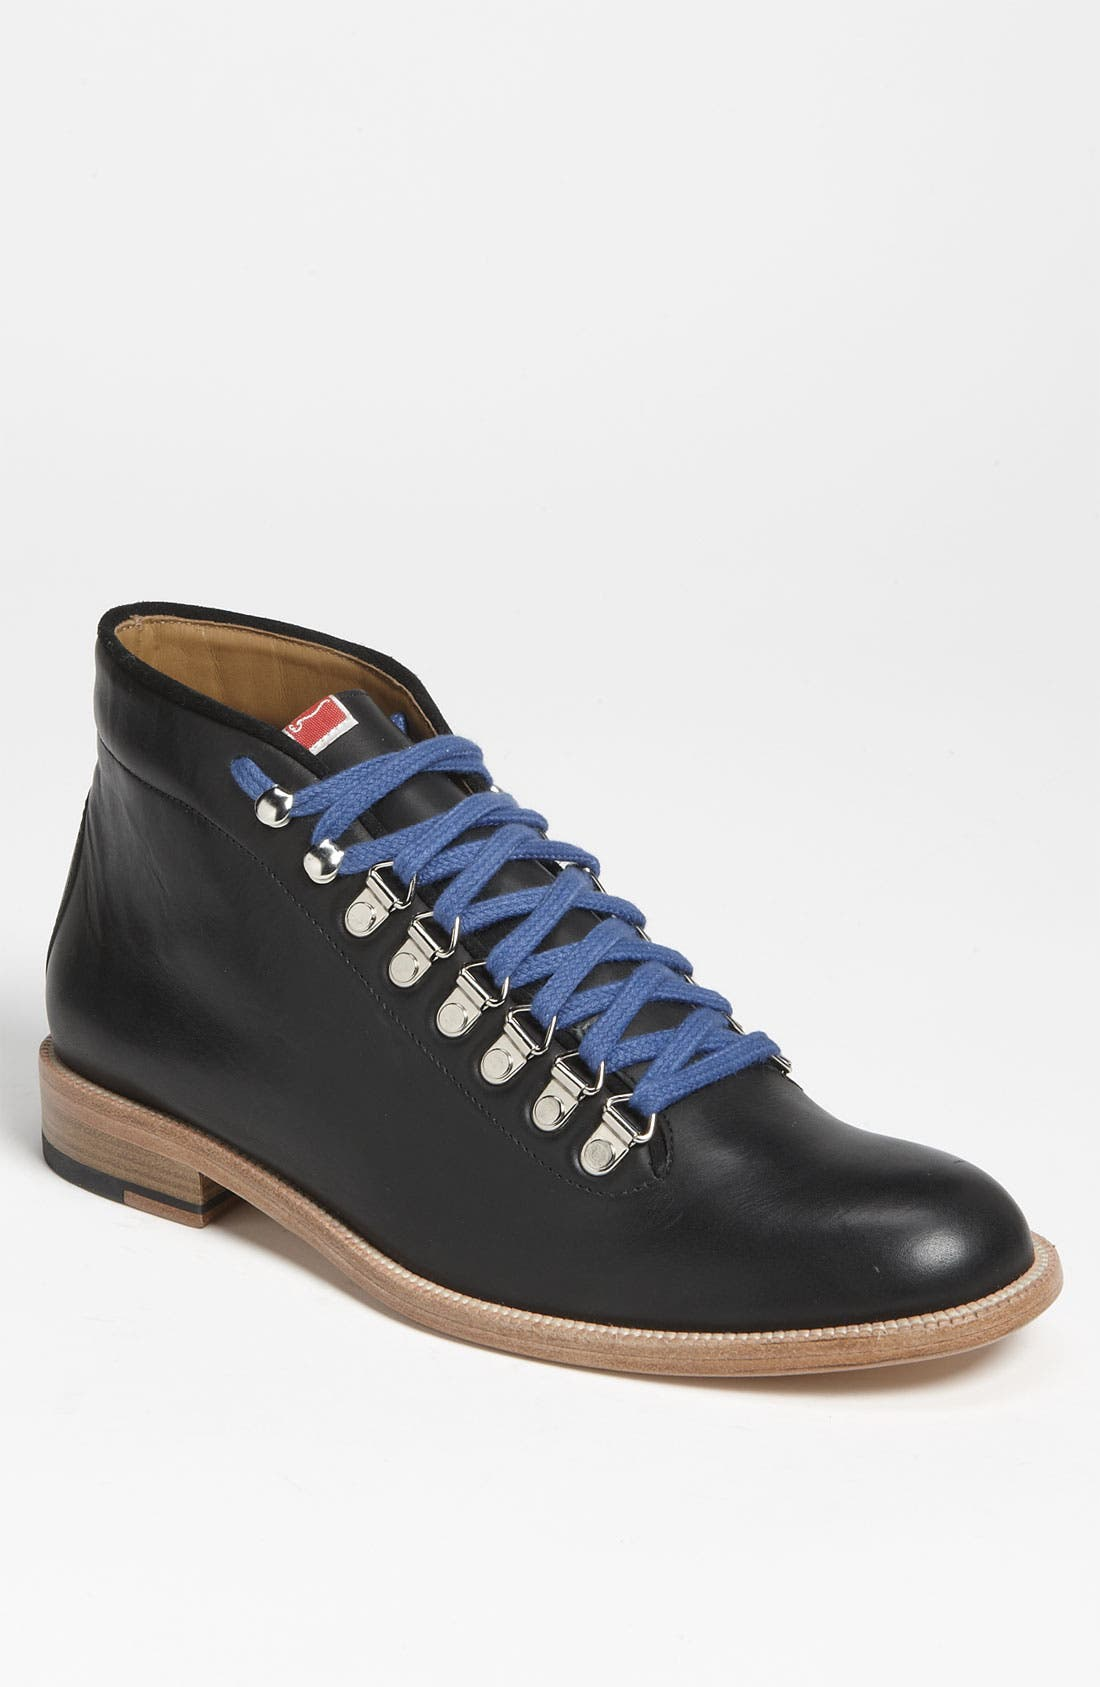 Alternate Image 1 Selected - Shipley & Halmos 'Nederland' Boot